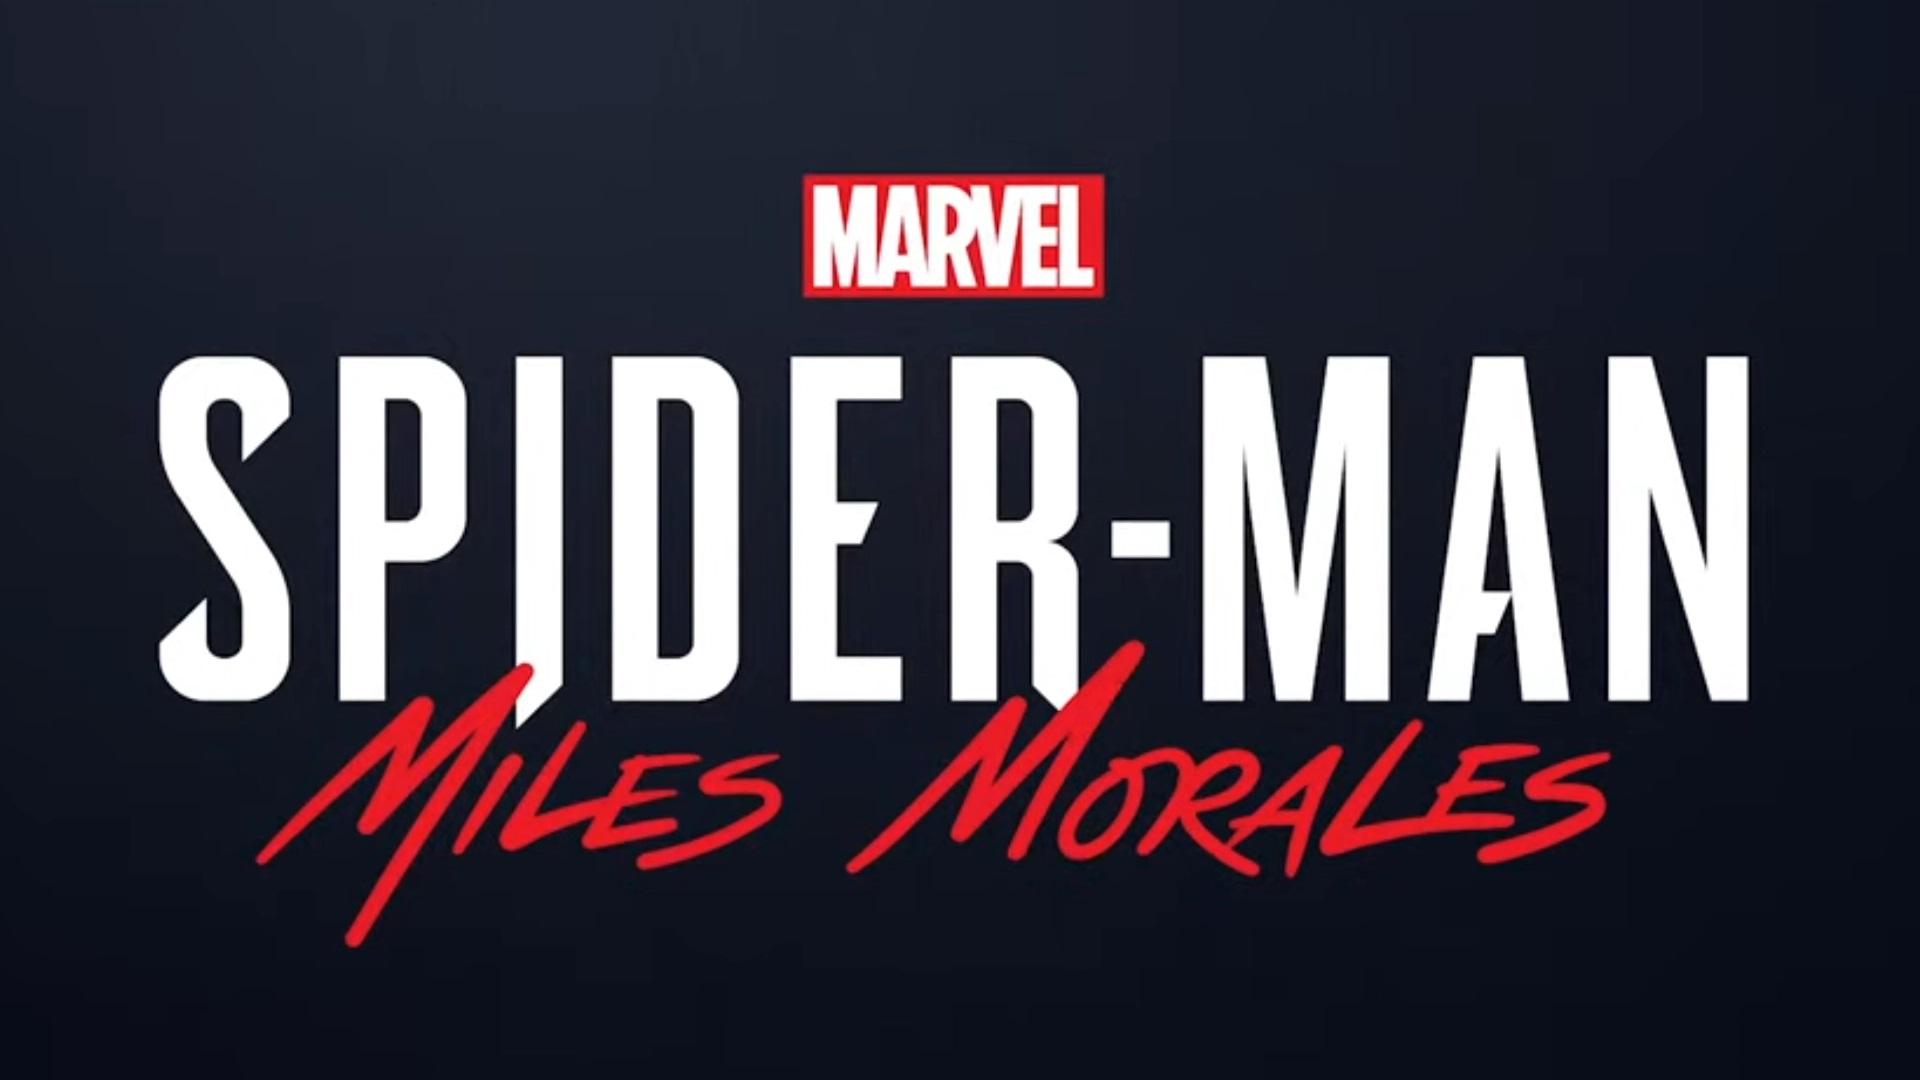 Marvel Spider-Man Miles Morales